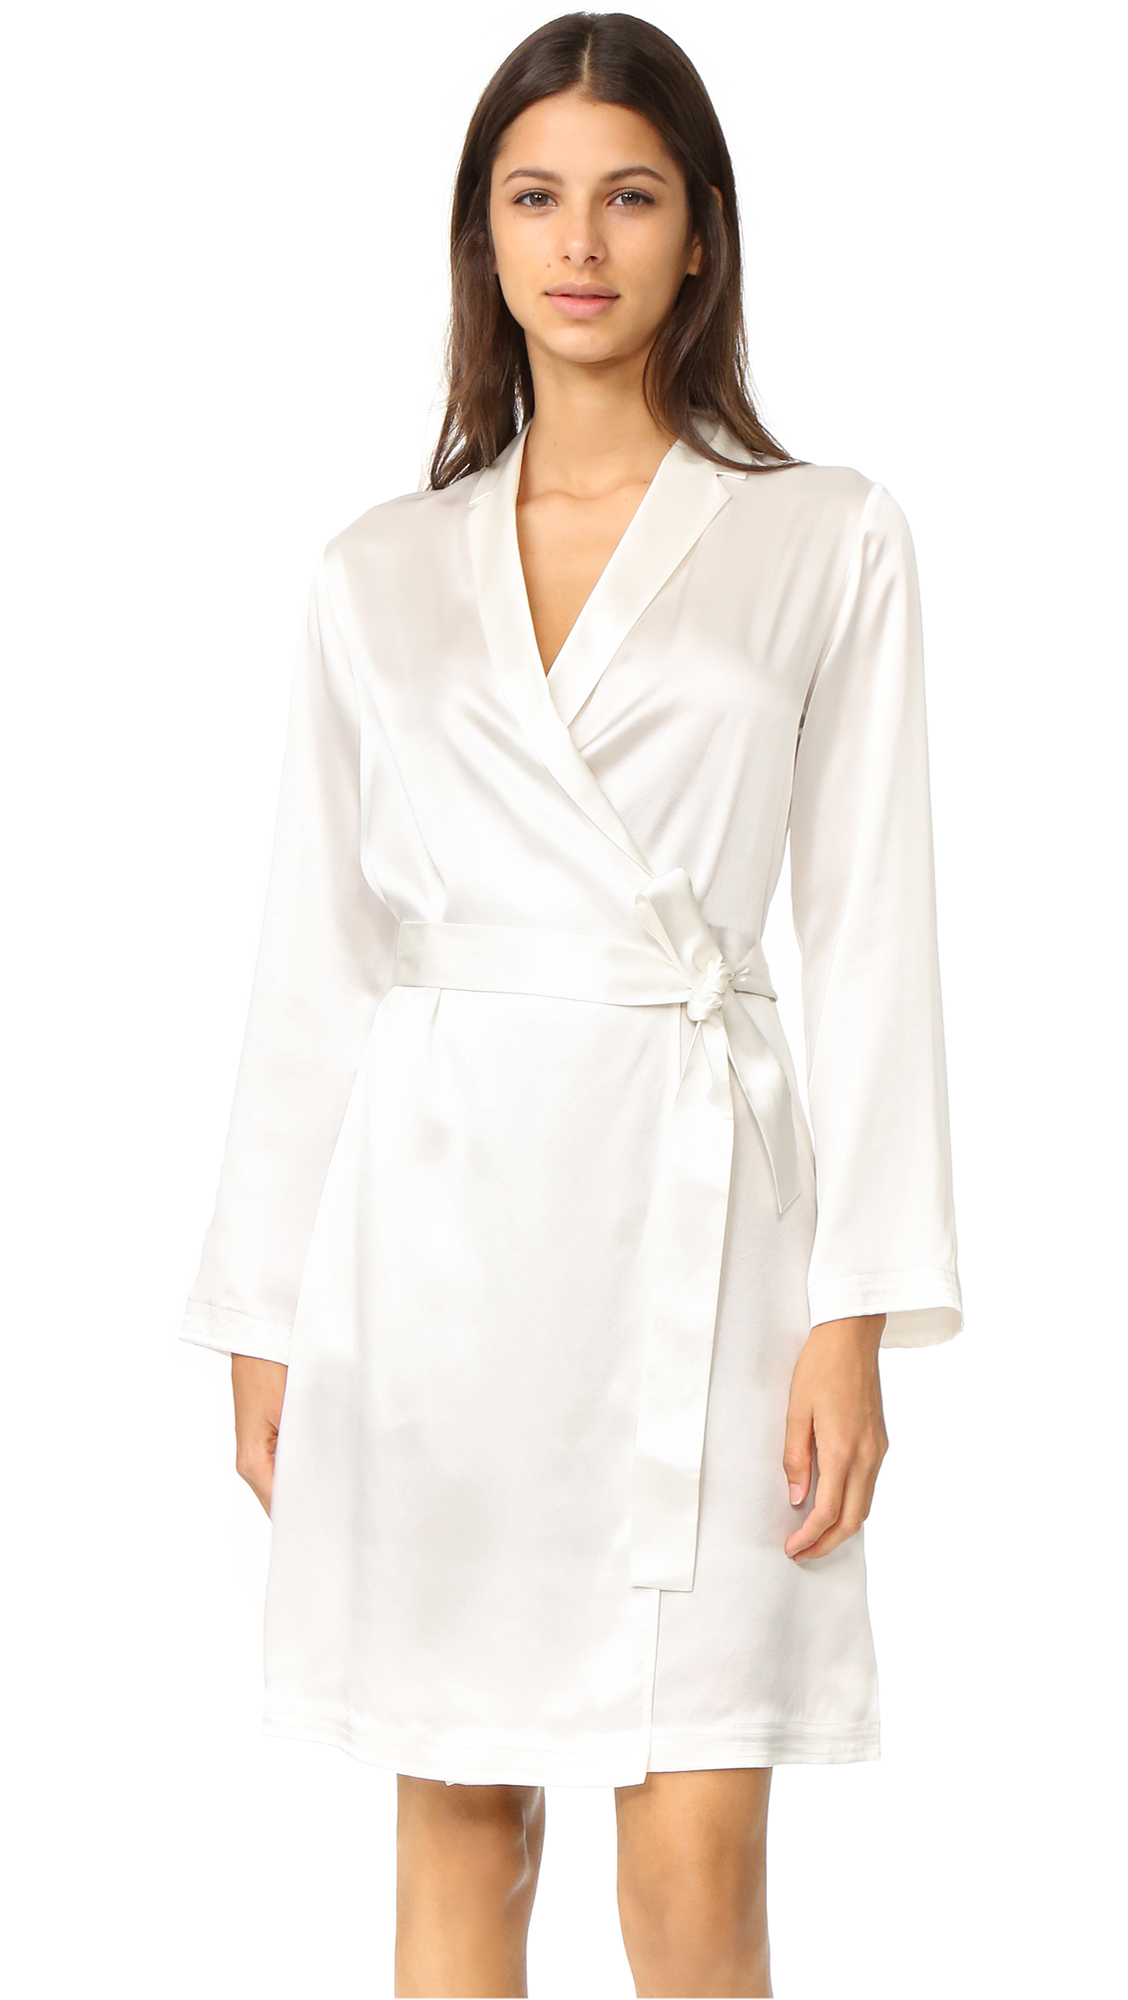 La Perla Silk Short Robe In White